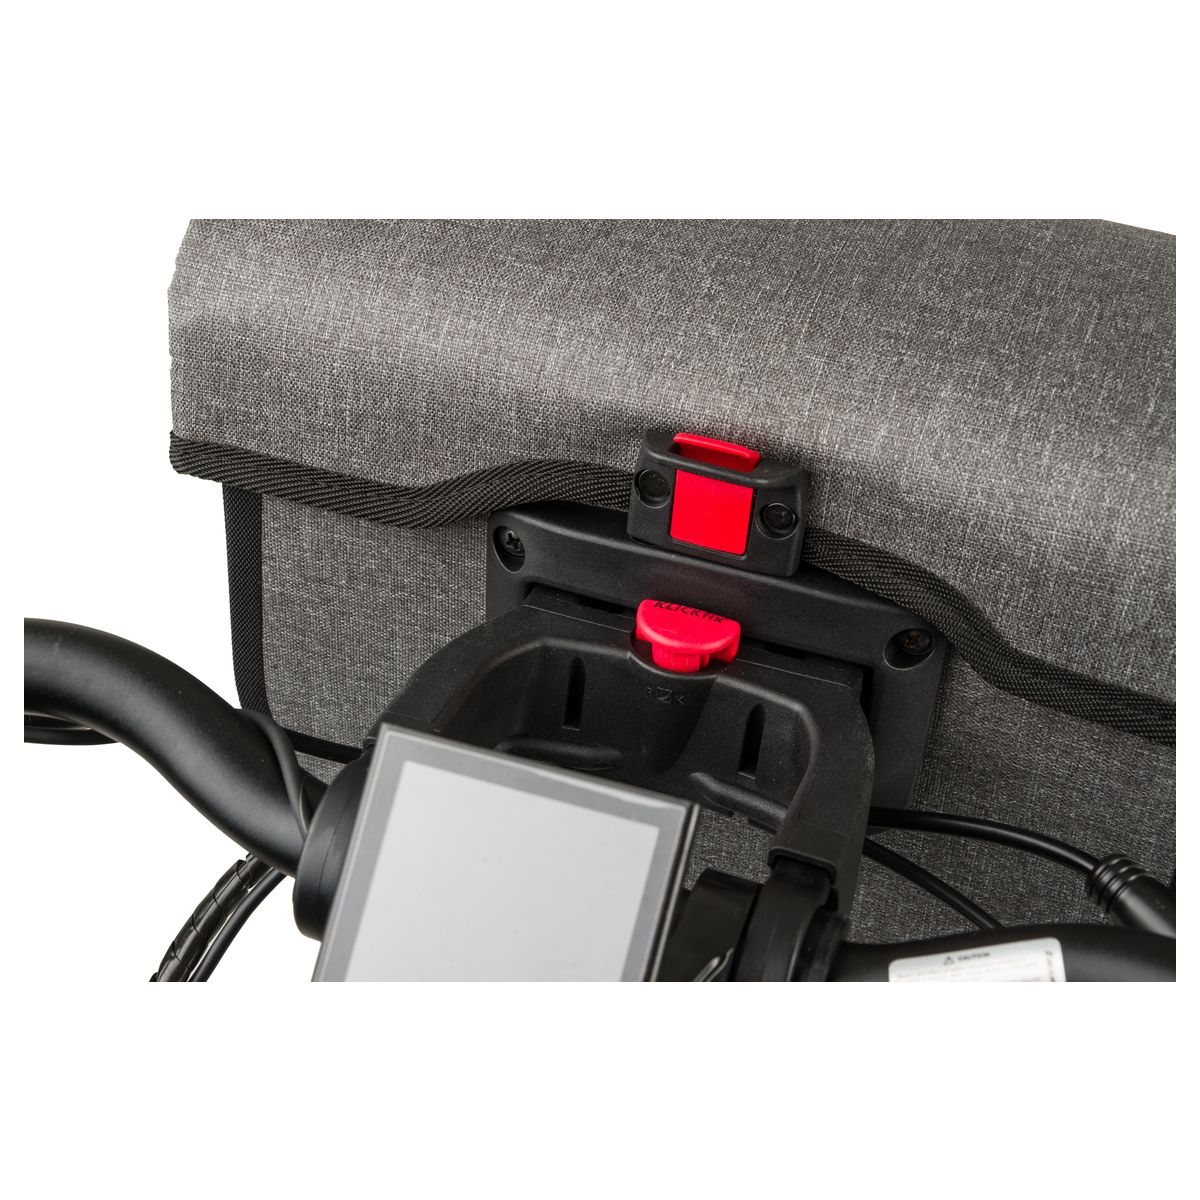 Tech Stuurtas Shelter fit example